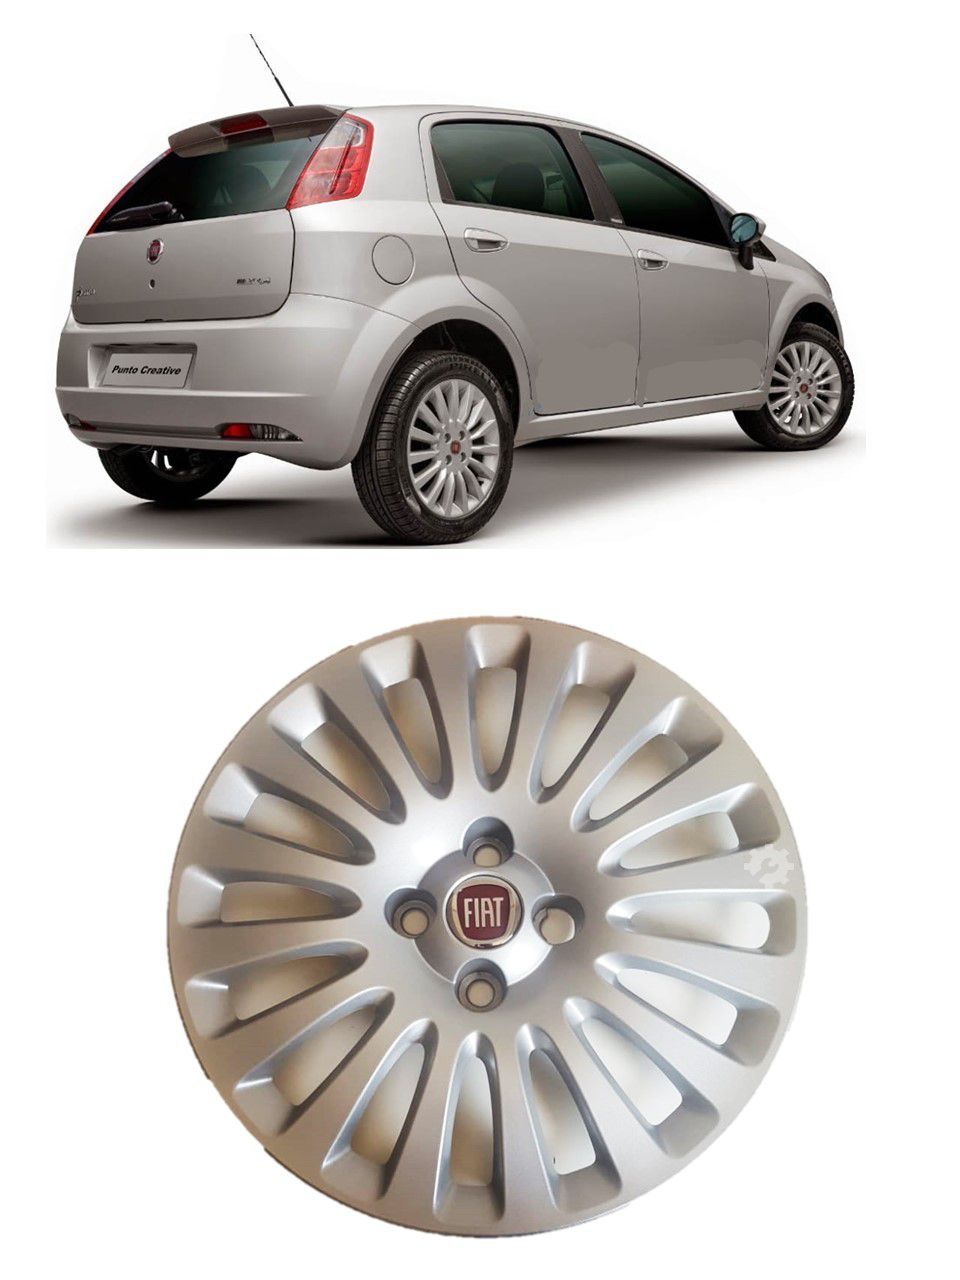 Calota Aro 15 Prata Fiat Punto 2013 2014 2015 2017 Original